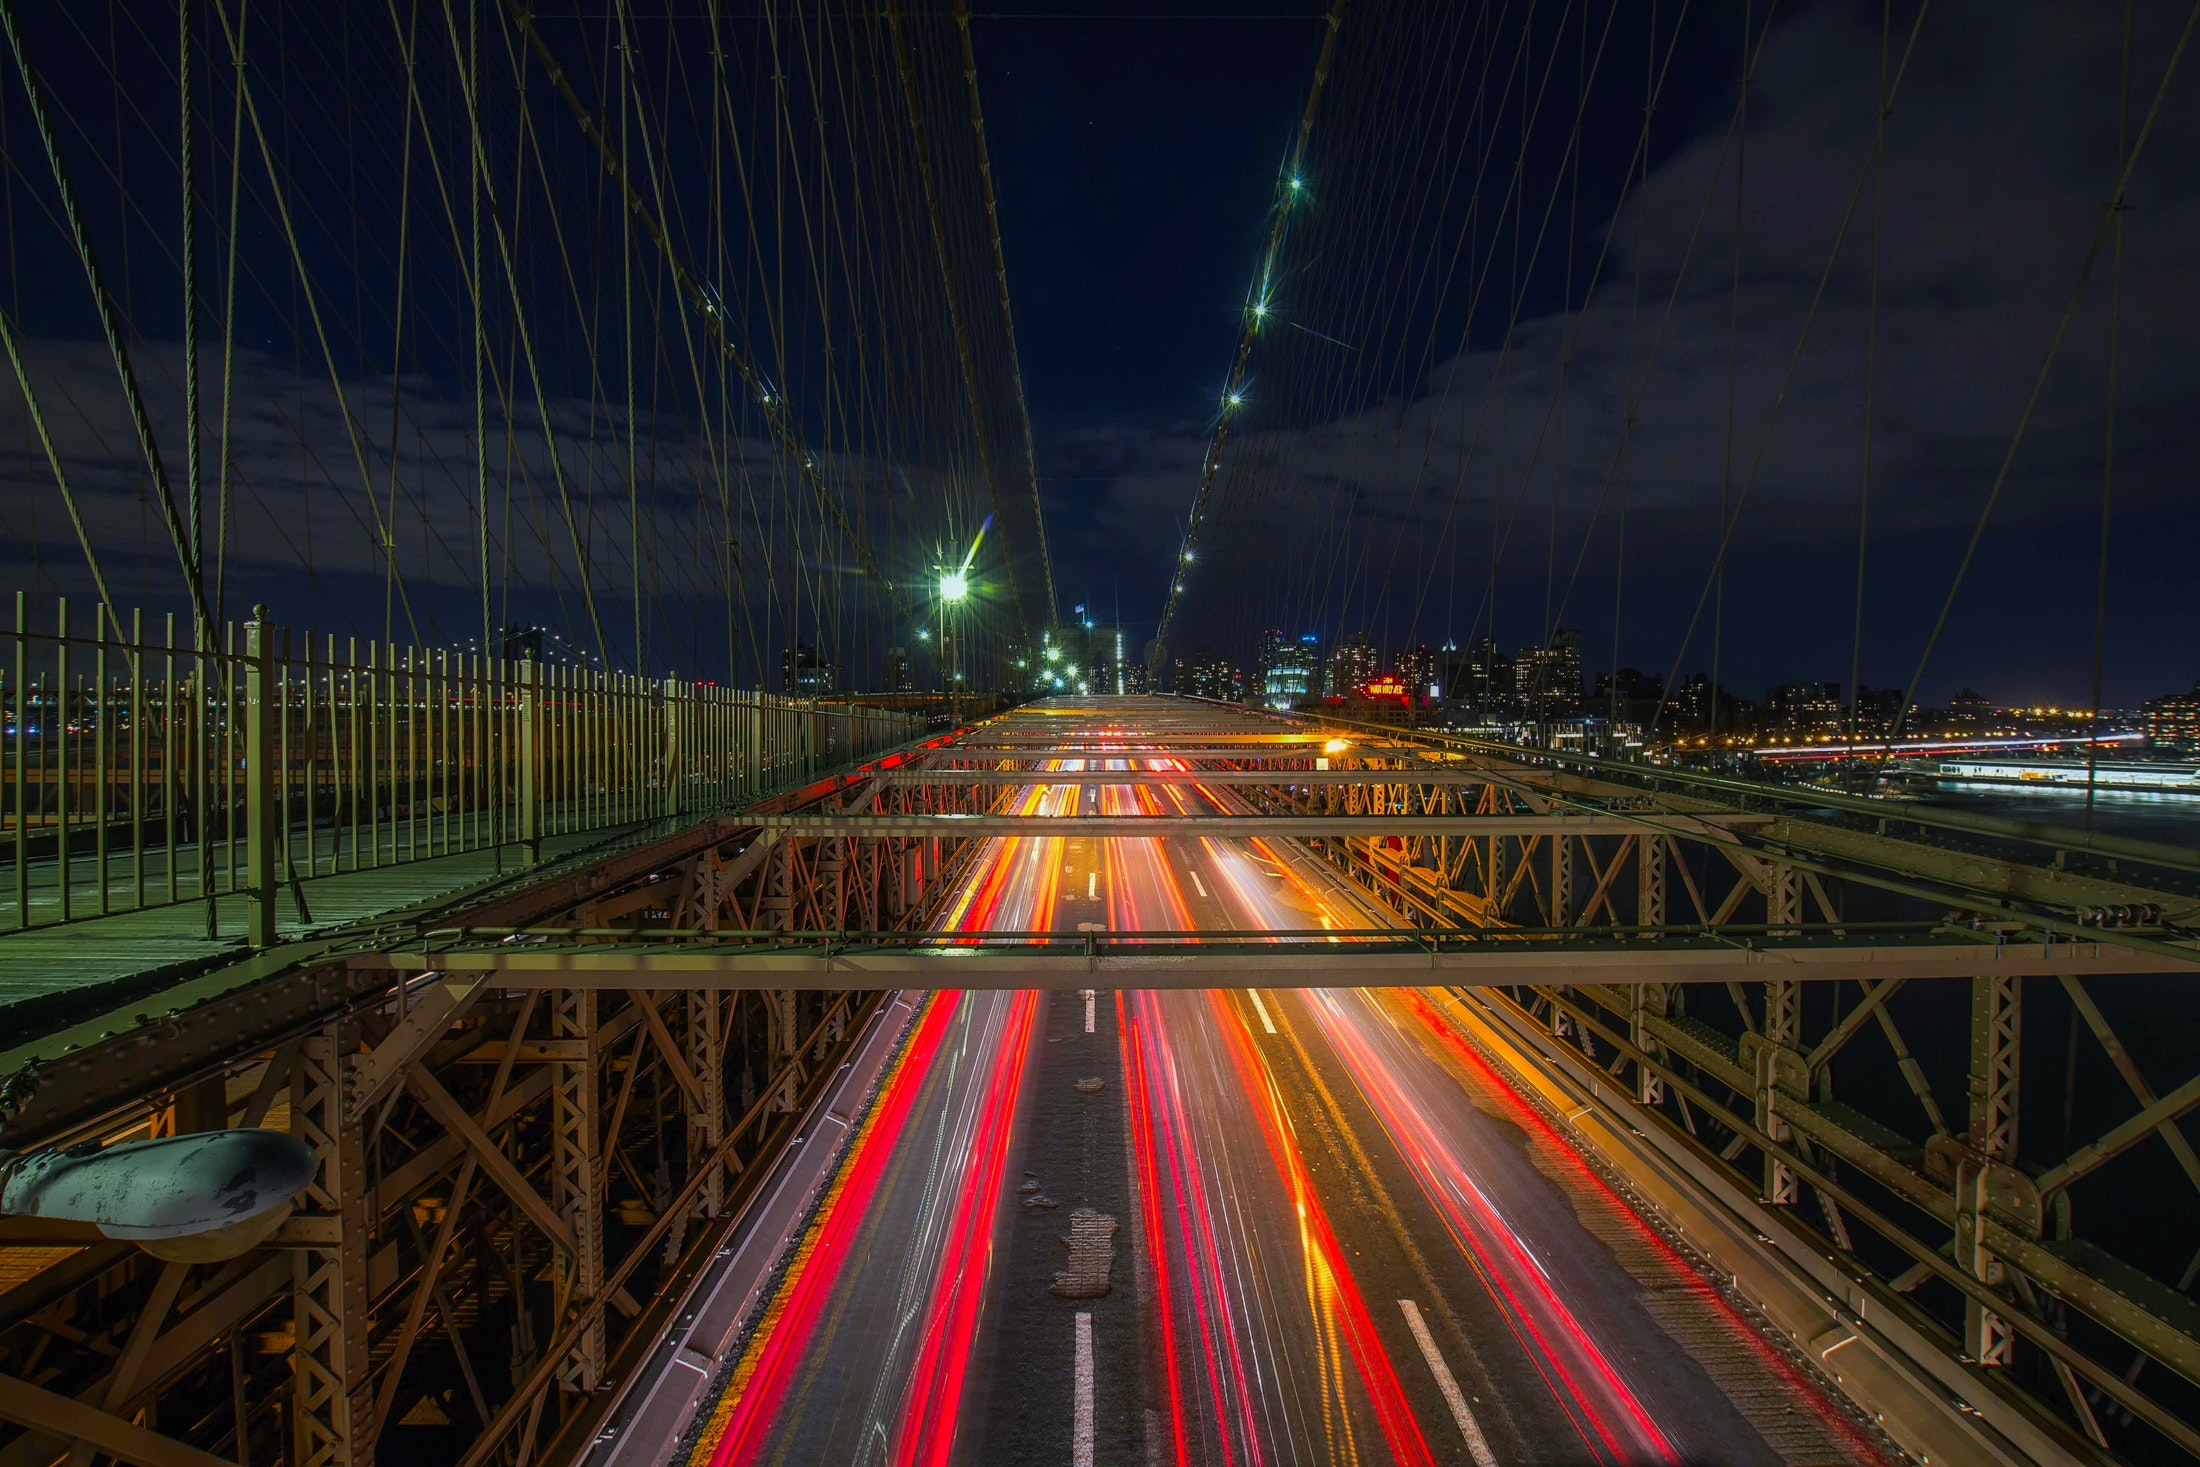 Highway at night photo